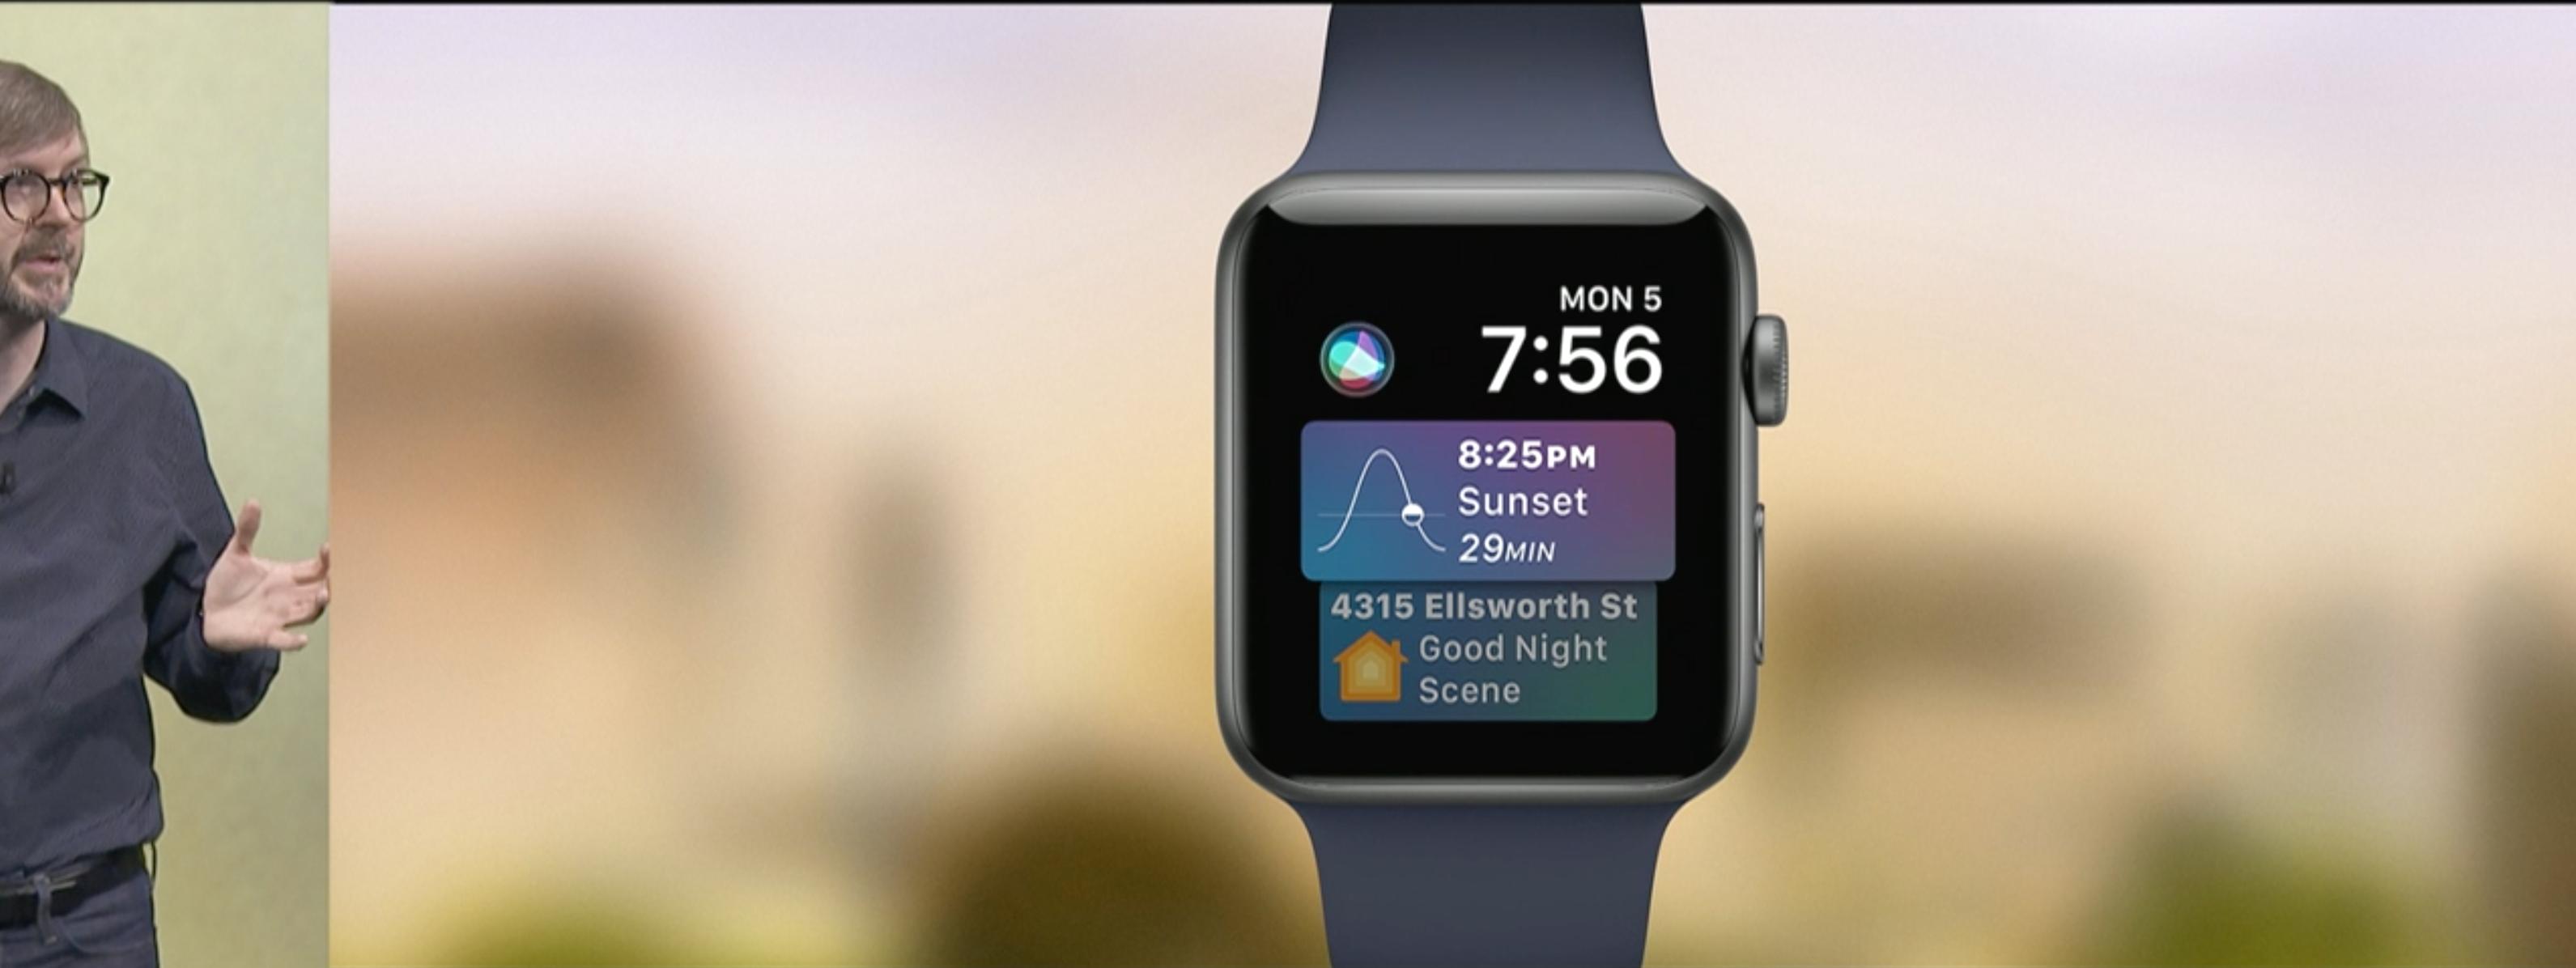 Nye Siri Face på Apple Watch OS 4.